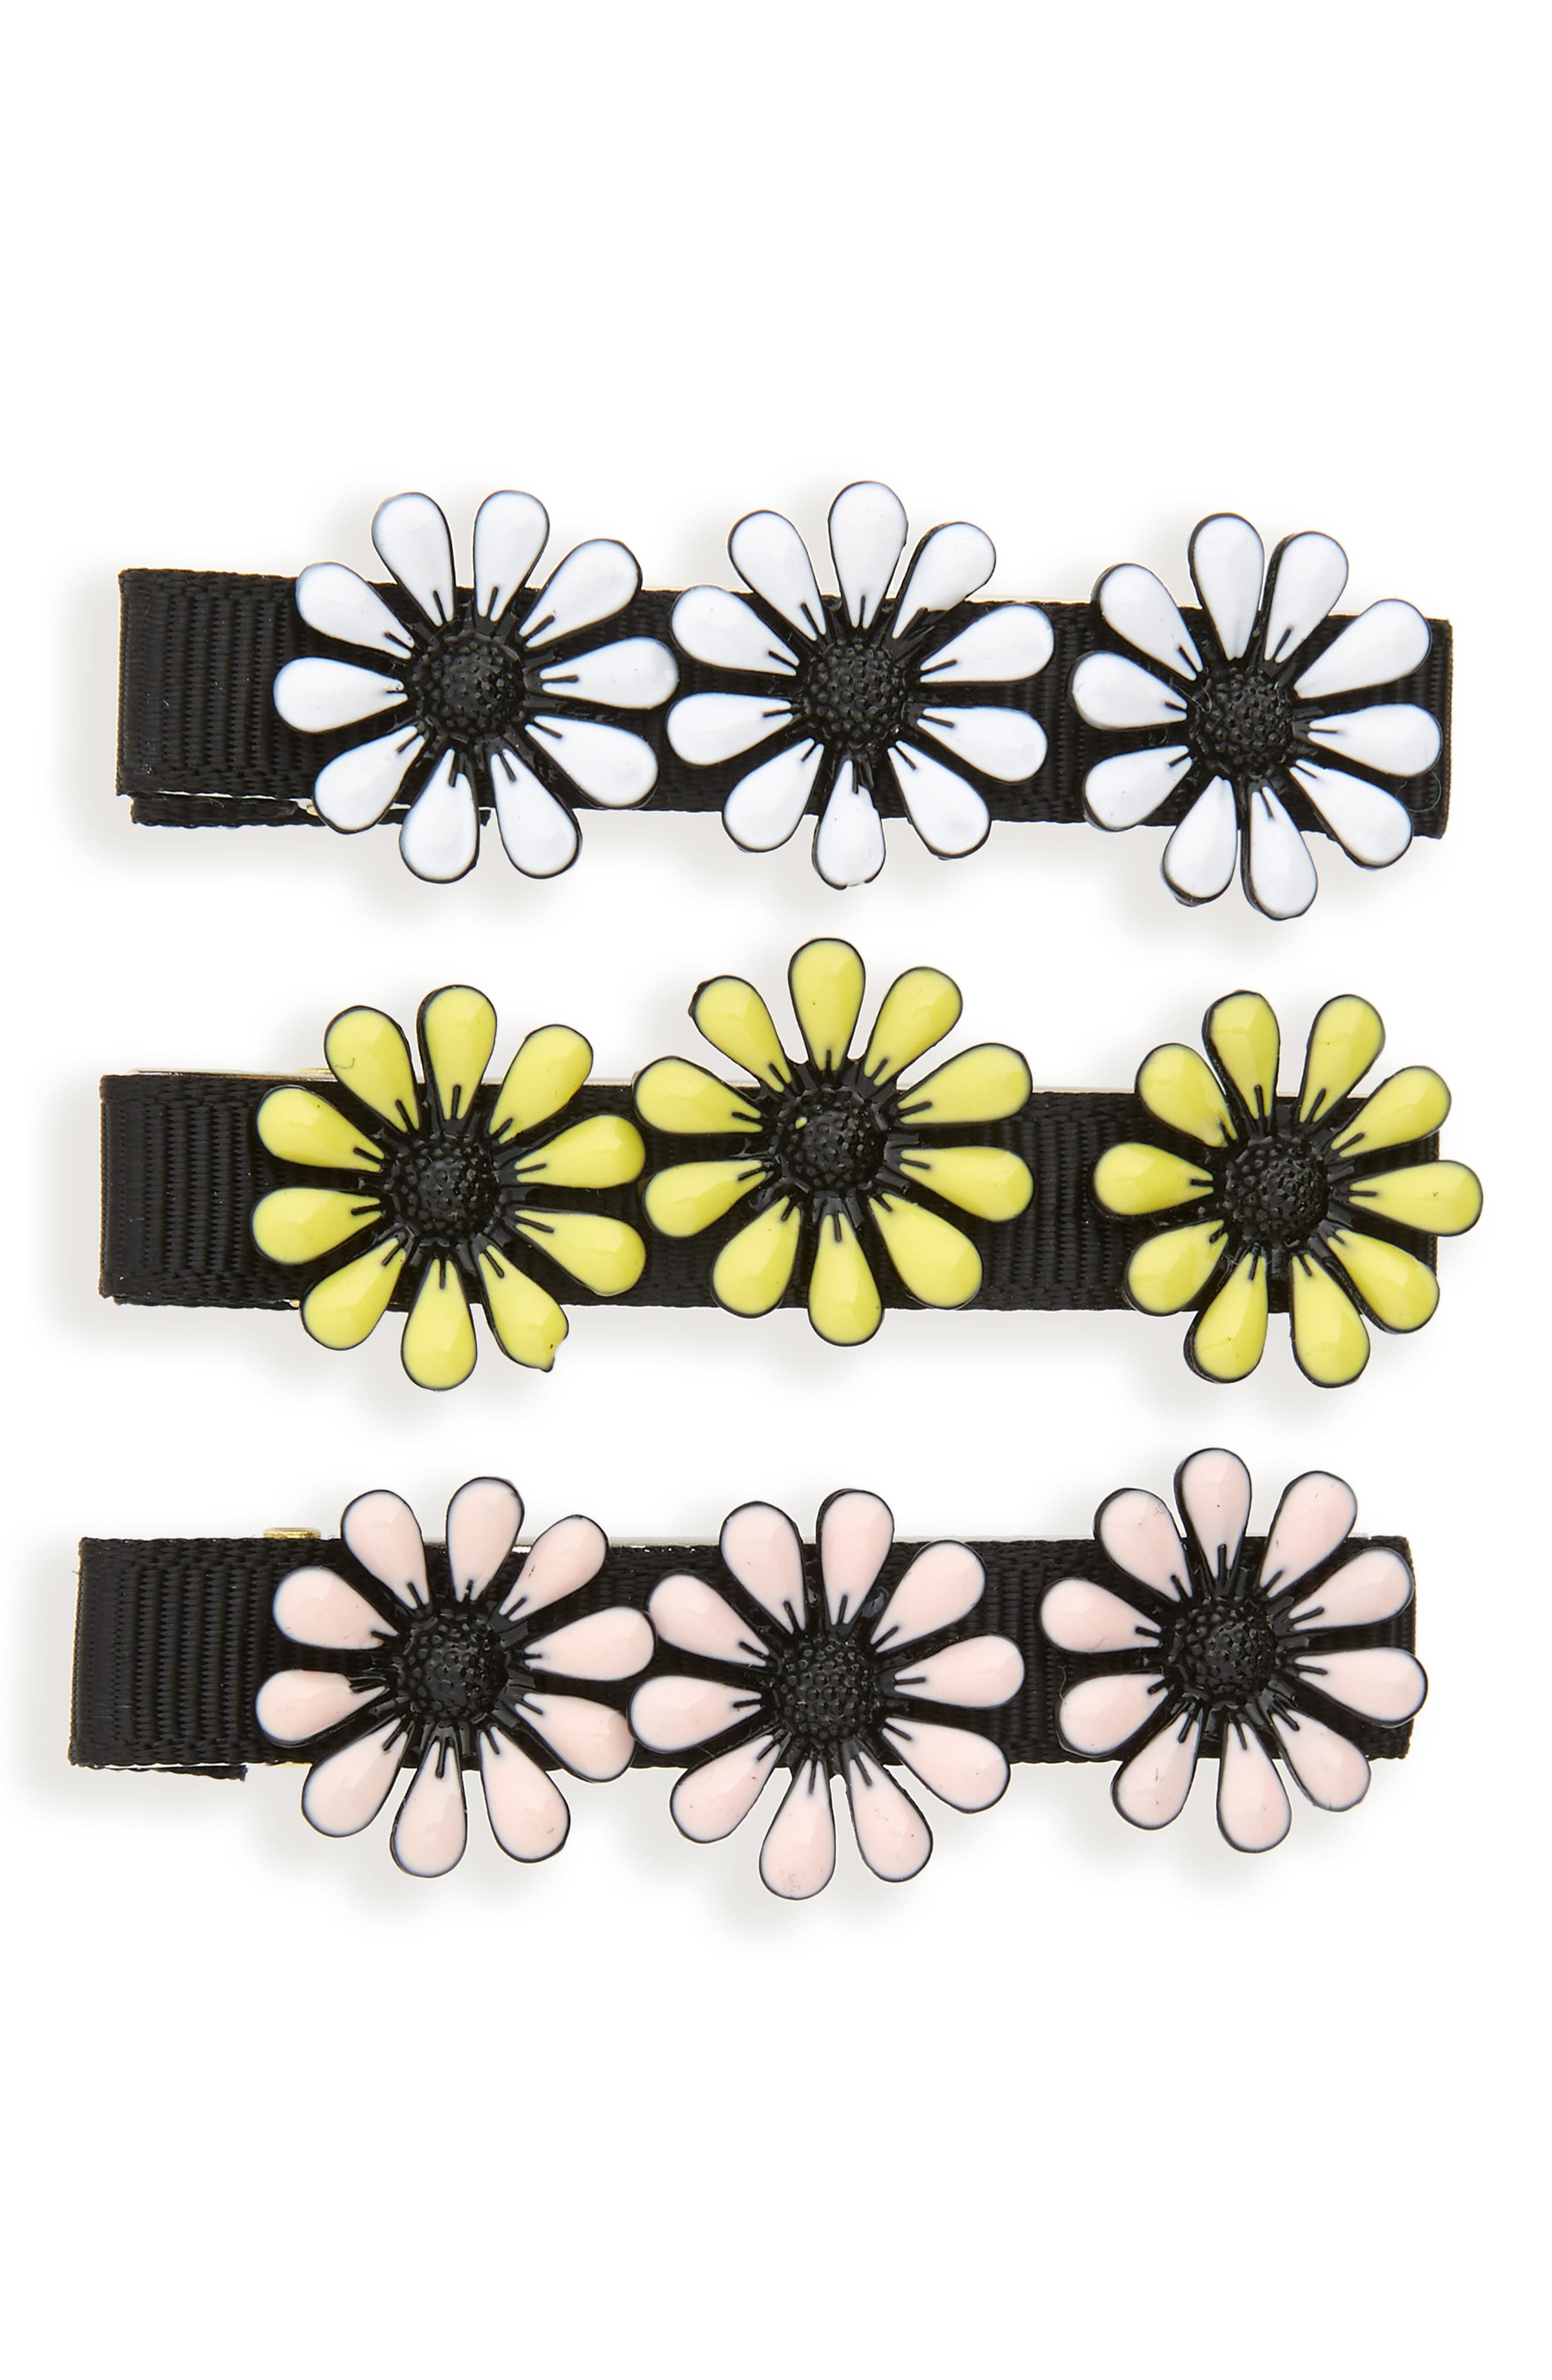 Set of 3 Enamel Daisy Hair Clips,                         Main,                         color, 001